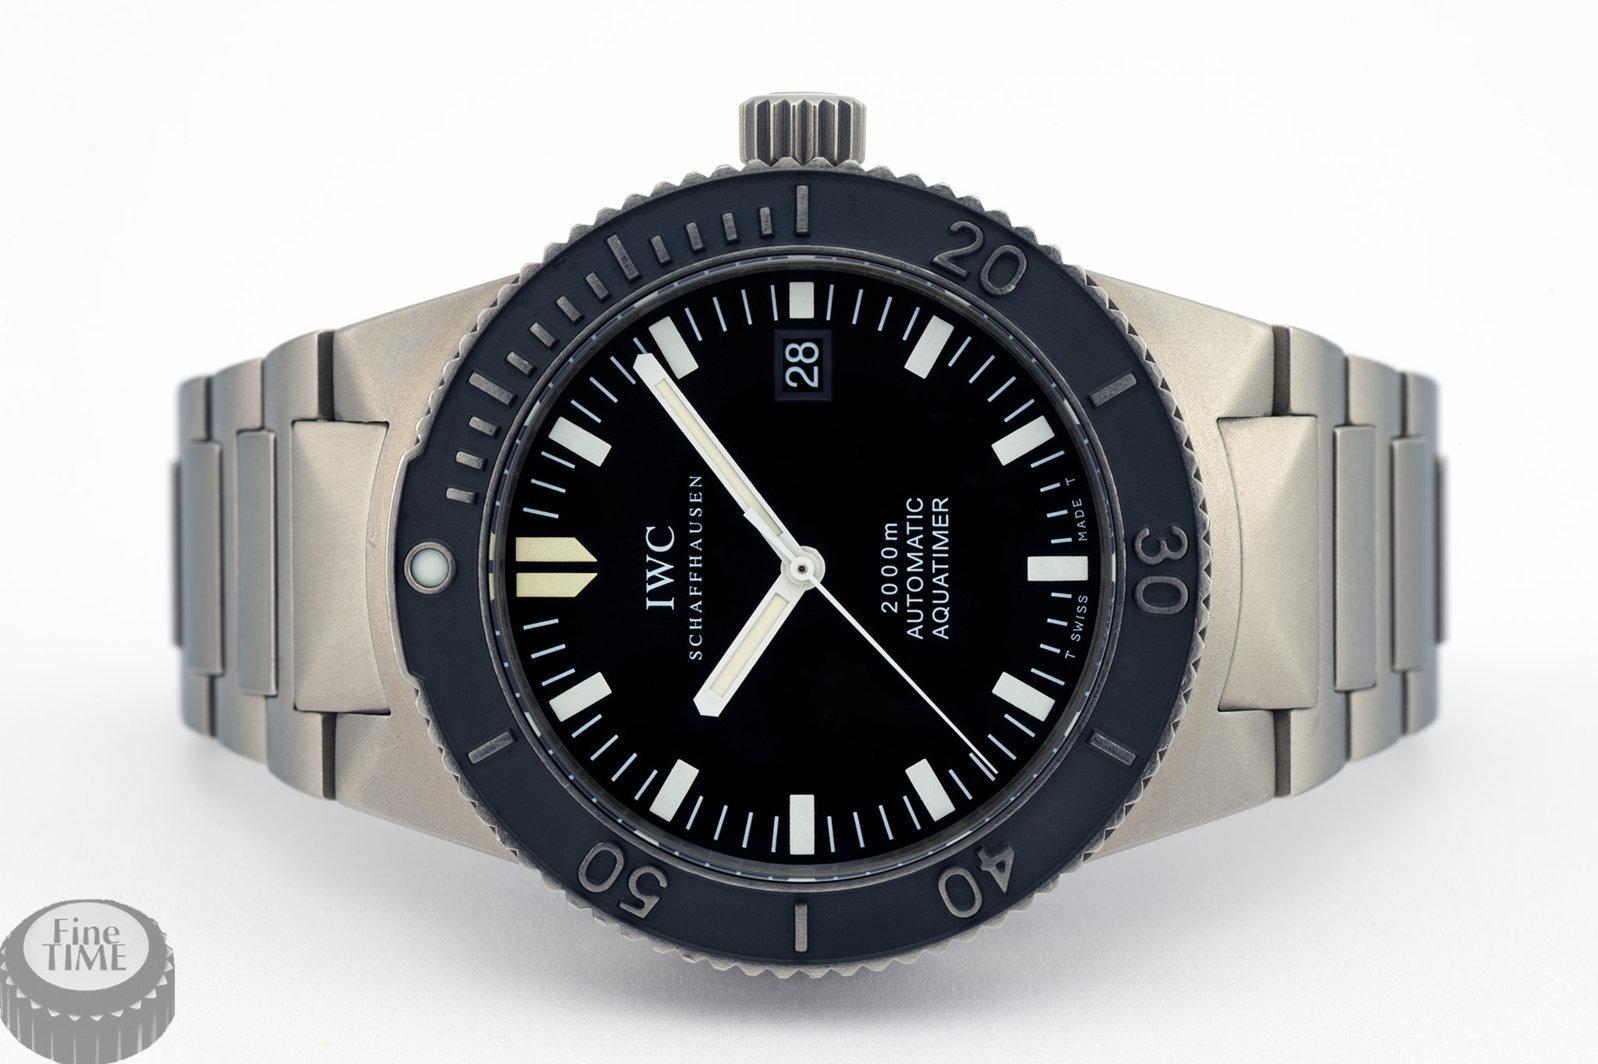 iwc-aquatimer-gst-iw3536-001-titanium-01.jpg